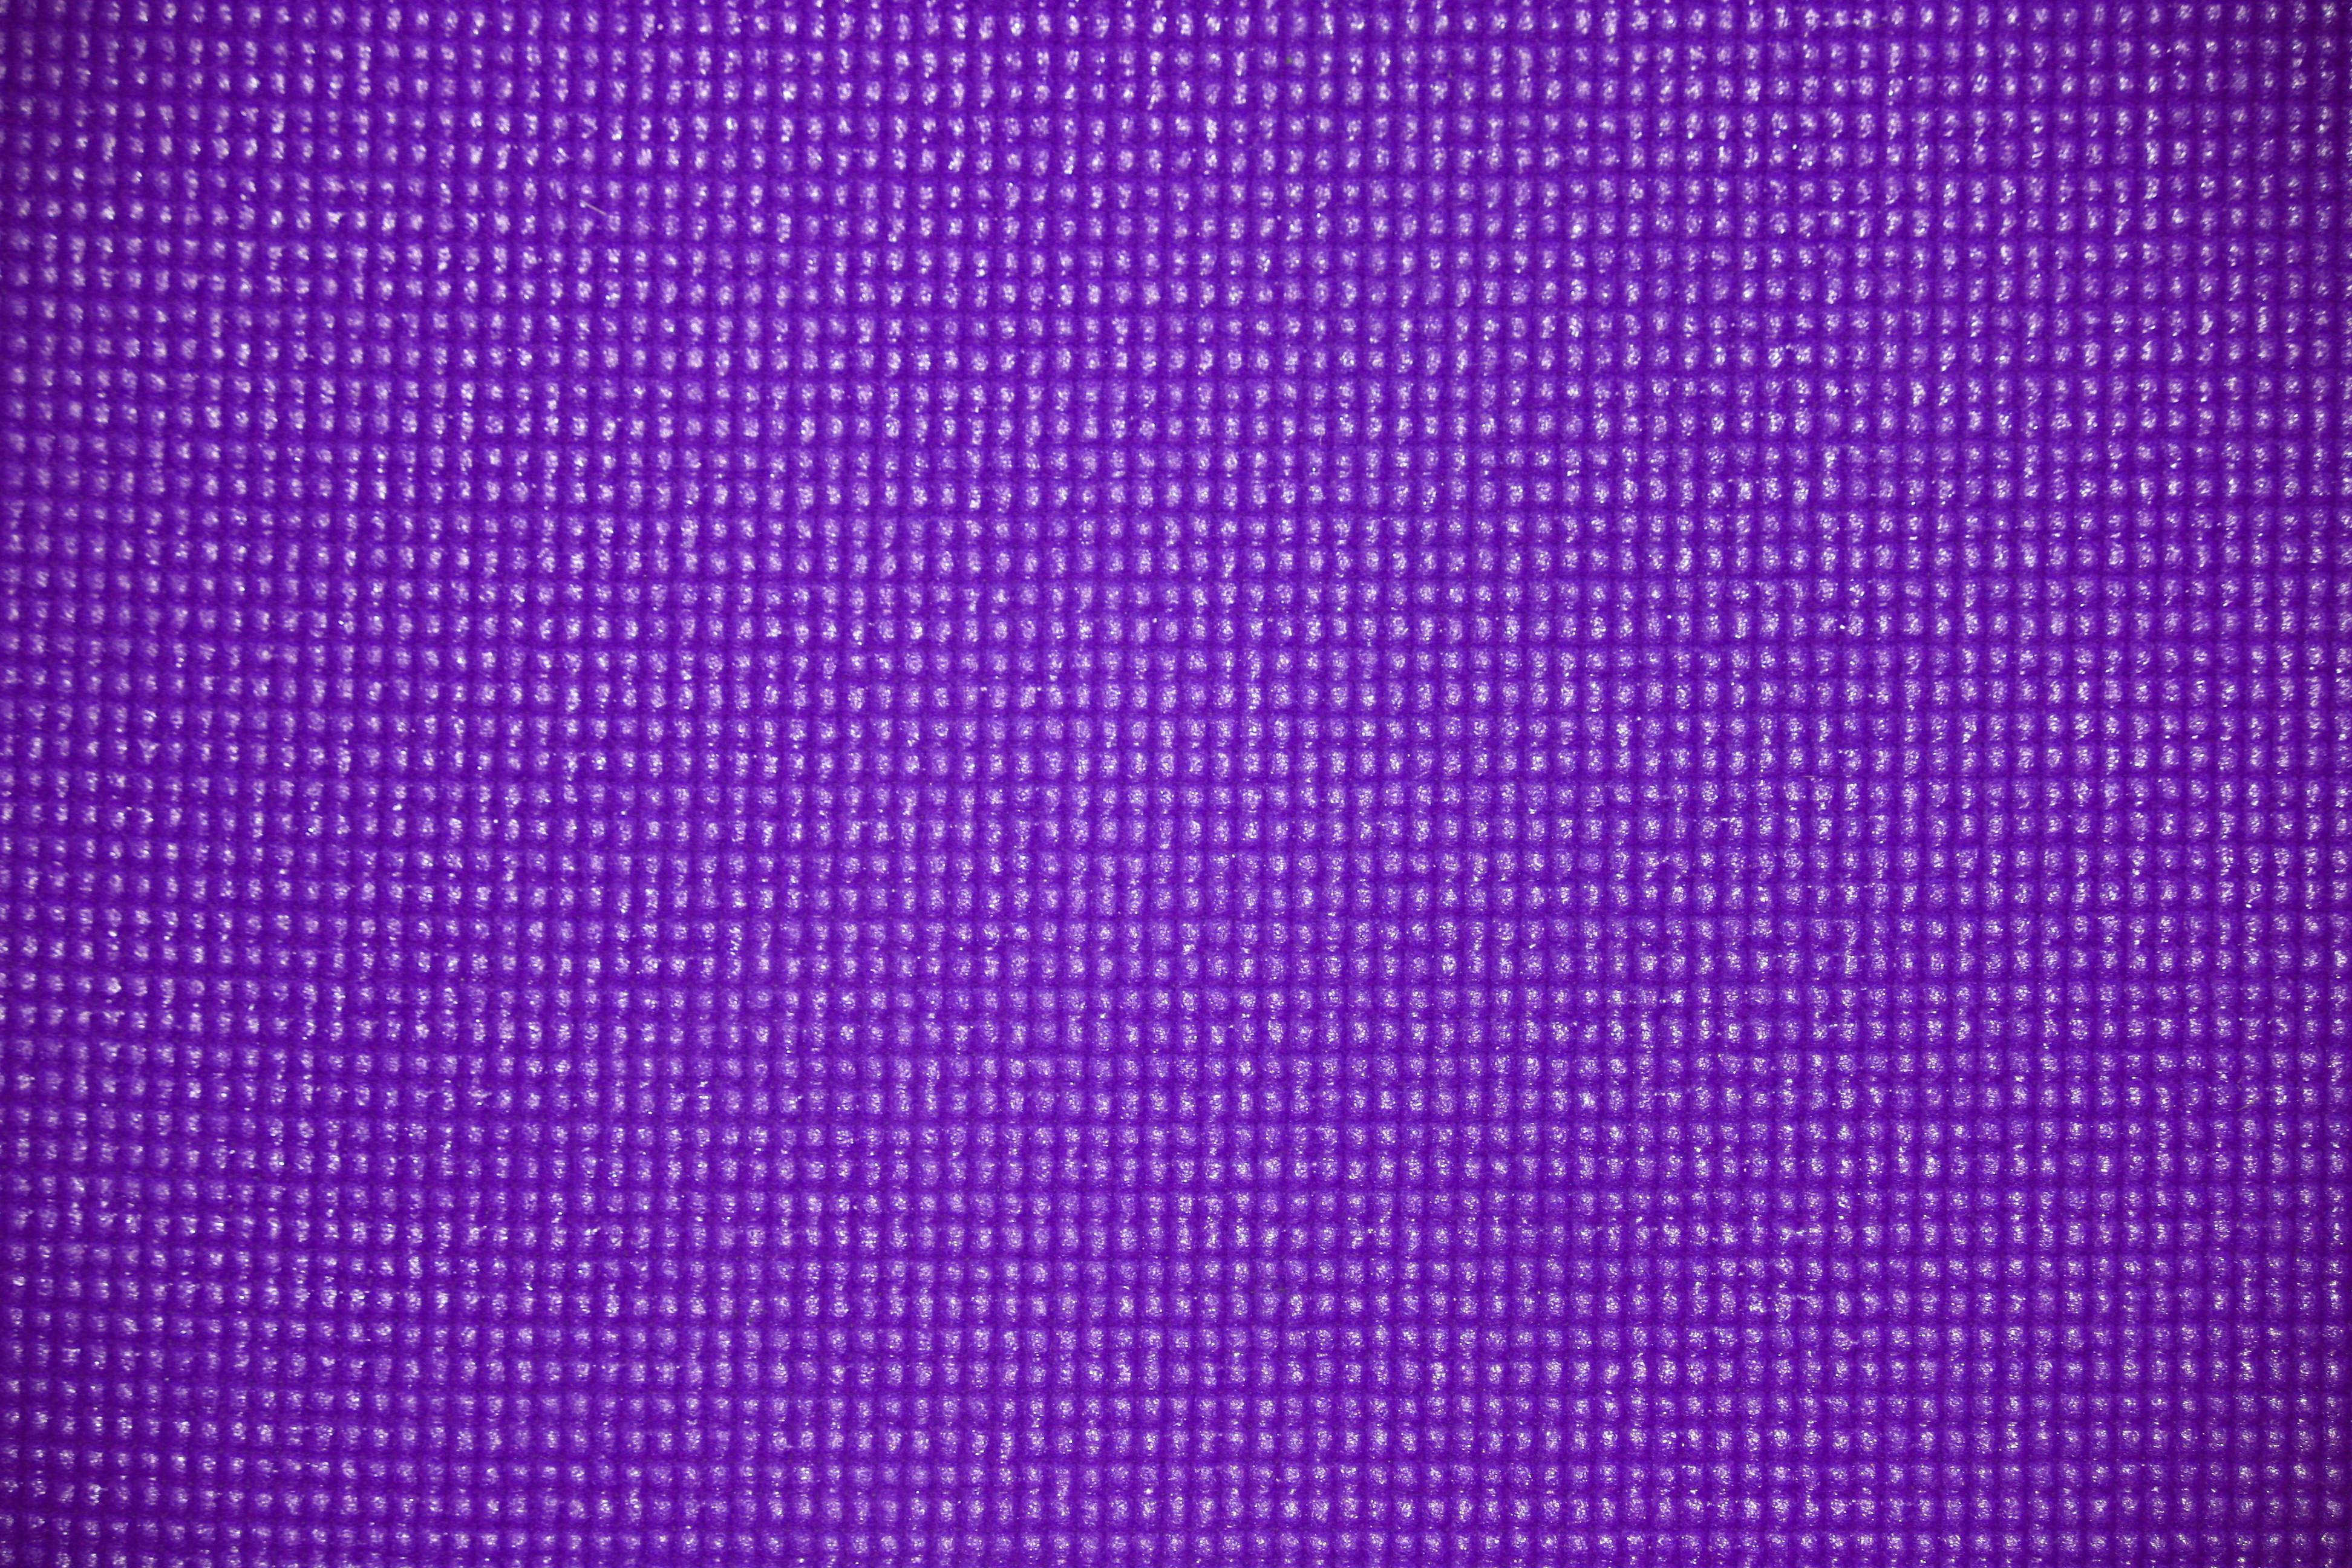 Purple Yoga Exercise Mat Texture Picture Free Photograph